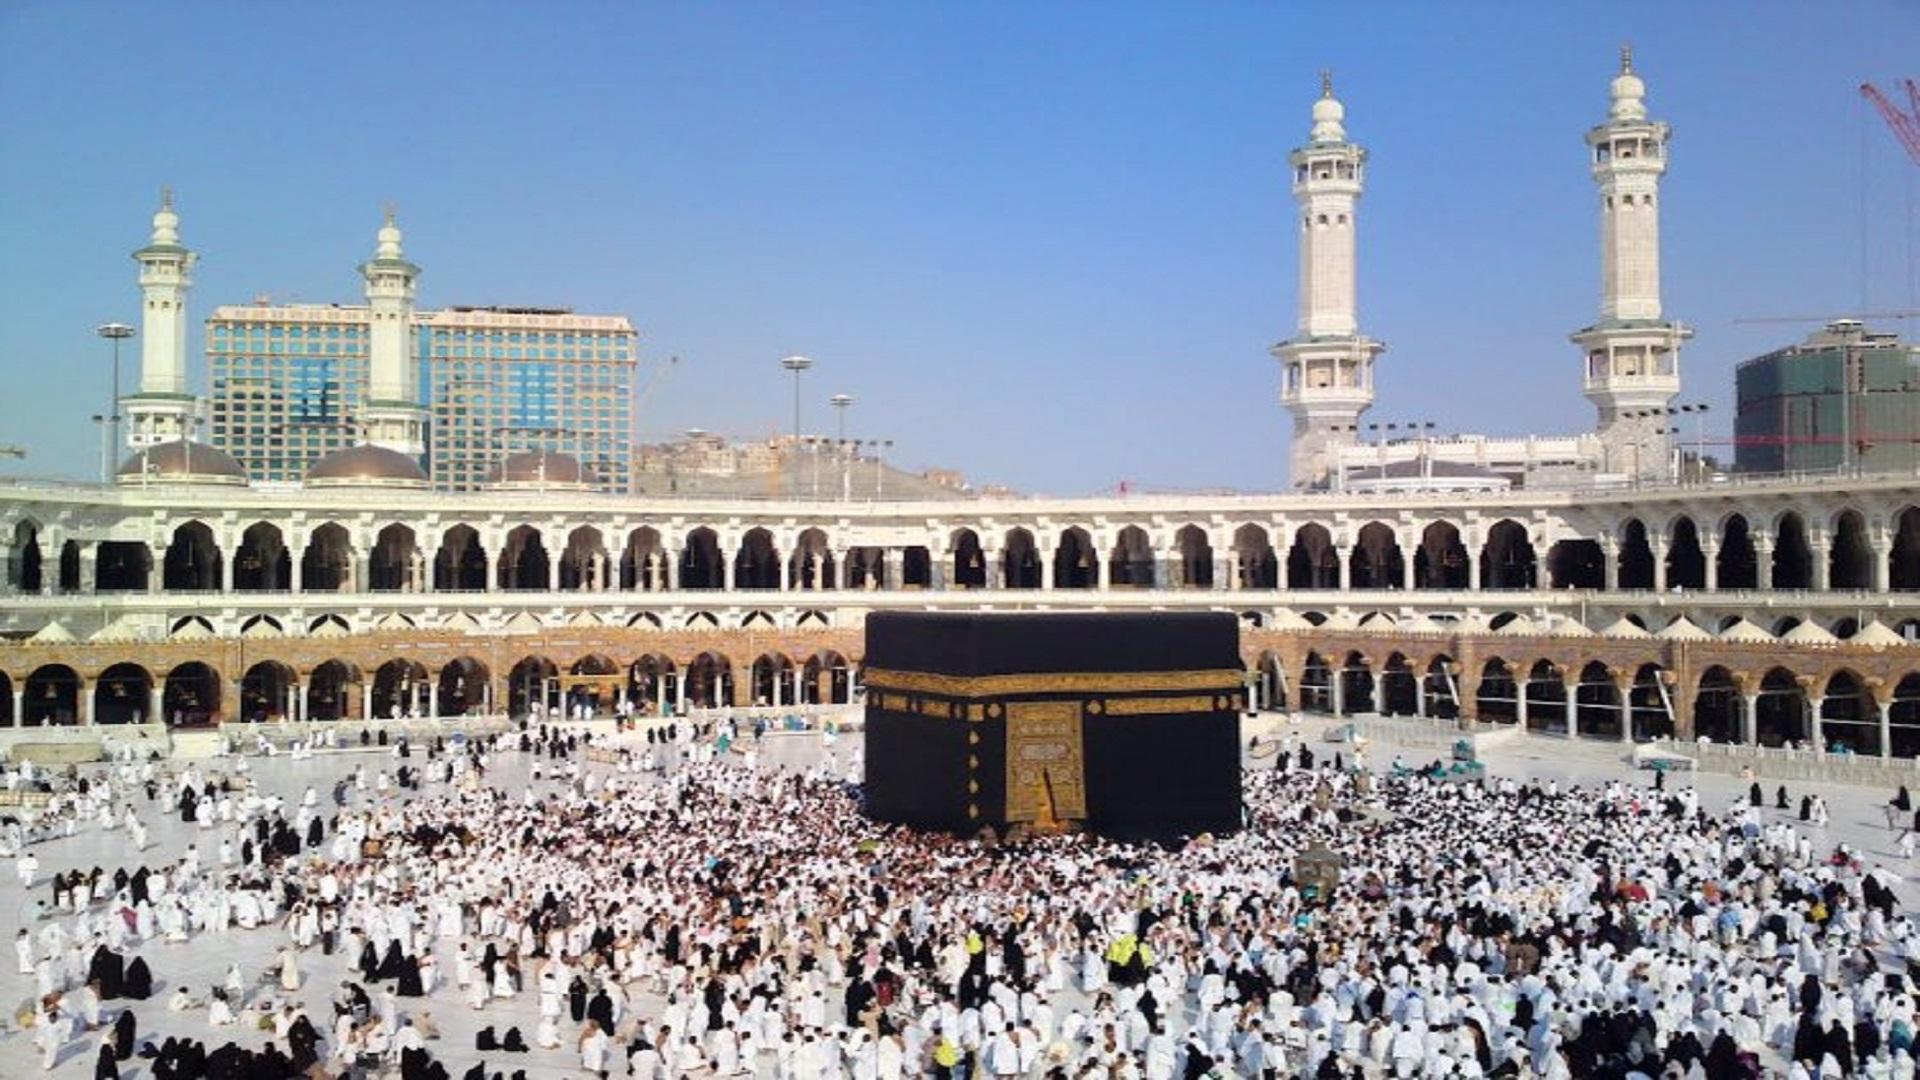 Free Download Khana Kaaba Most Beautiful Hd Wallpapers 1920x1080